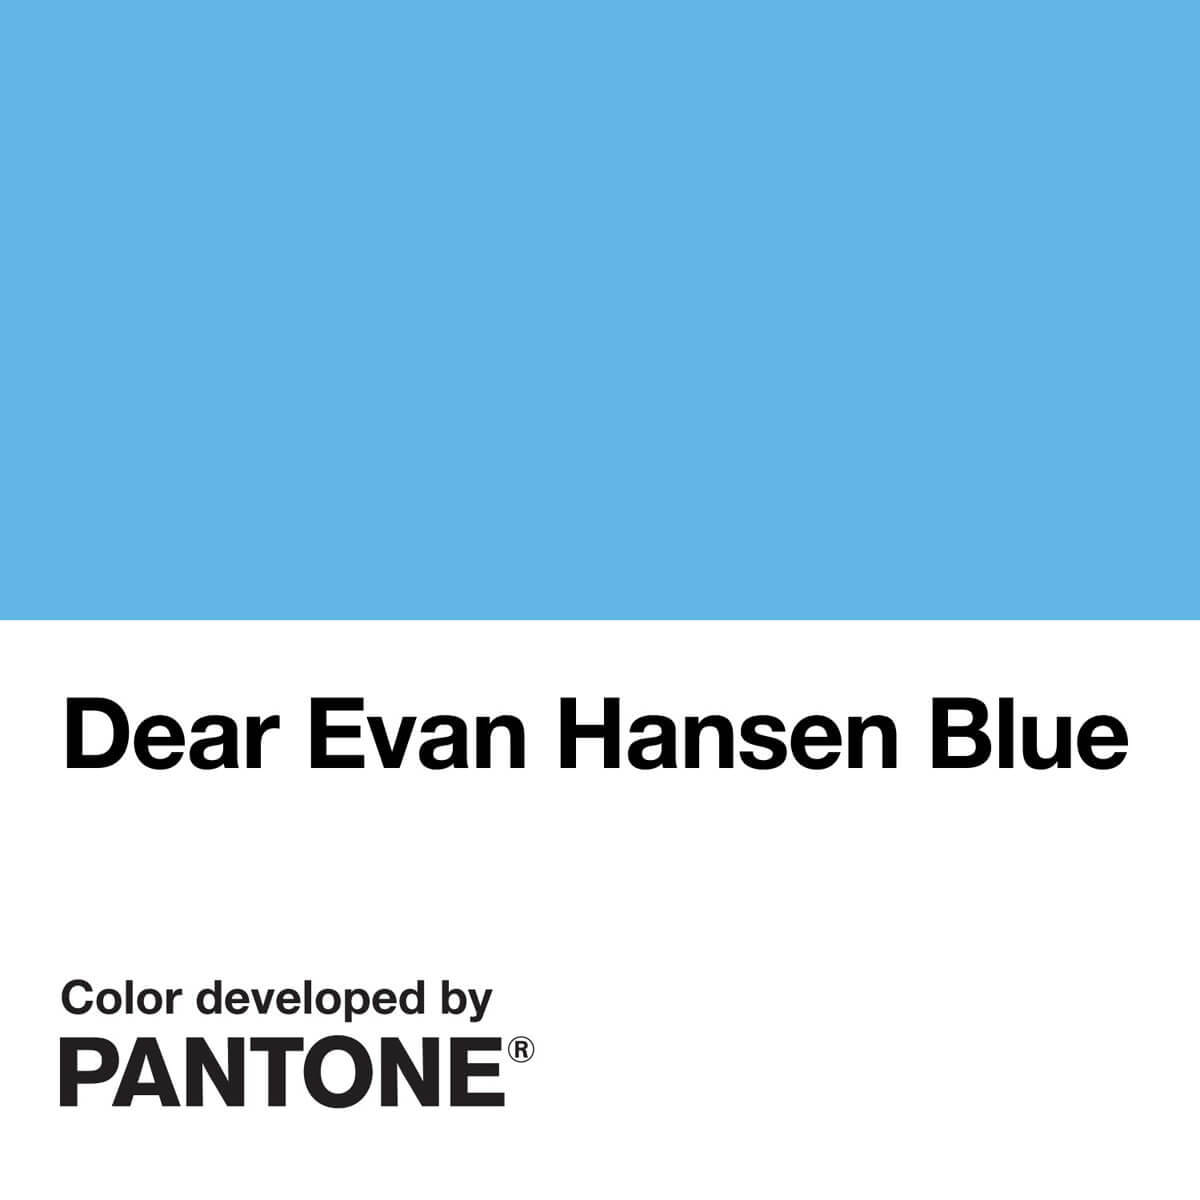 Pantone_Dear Evan Hansen